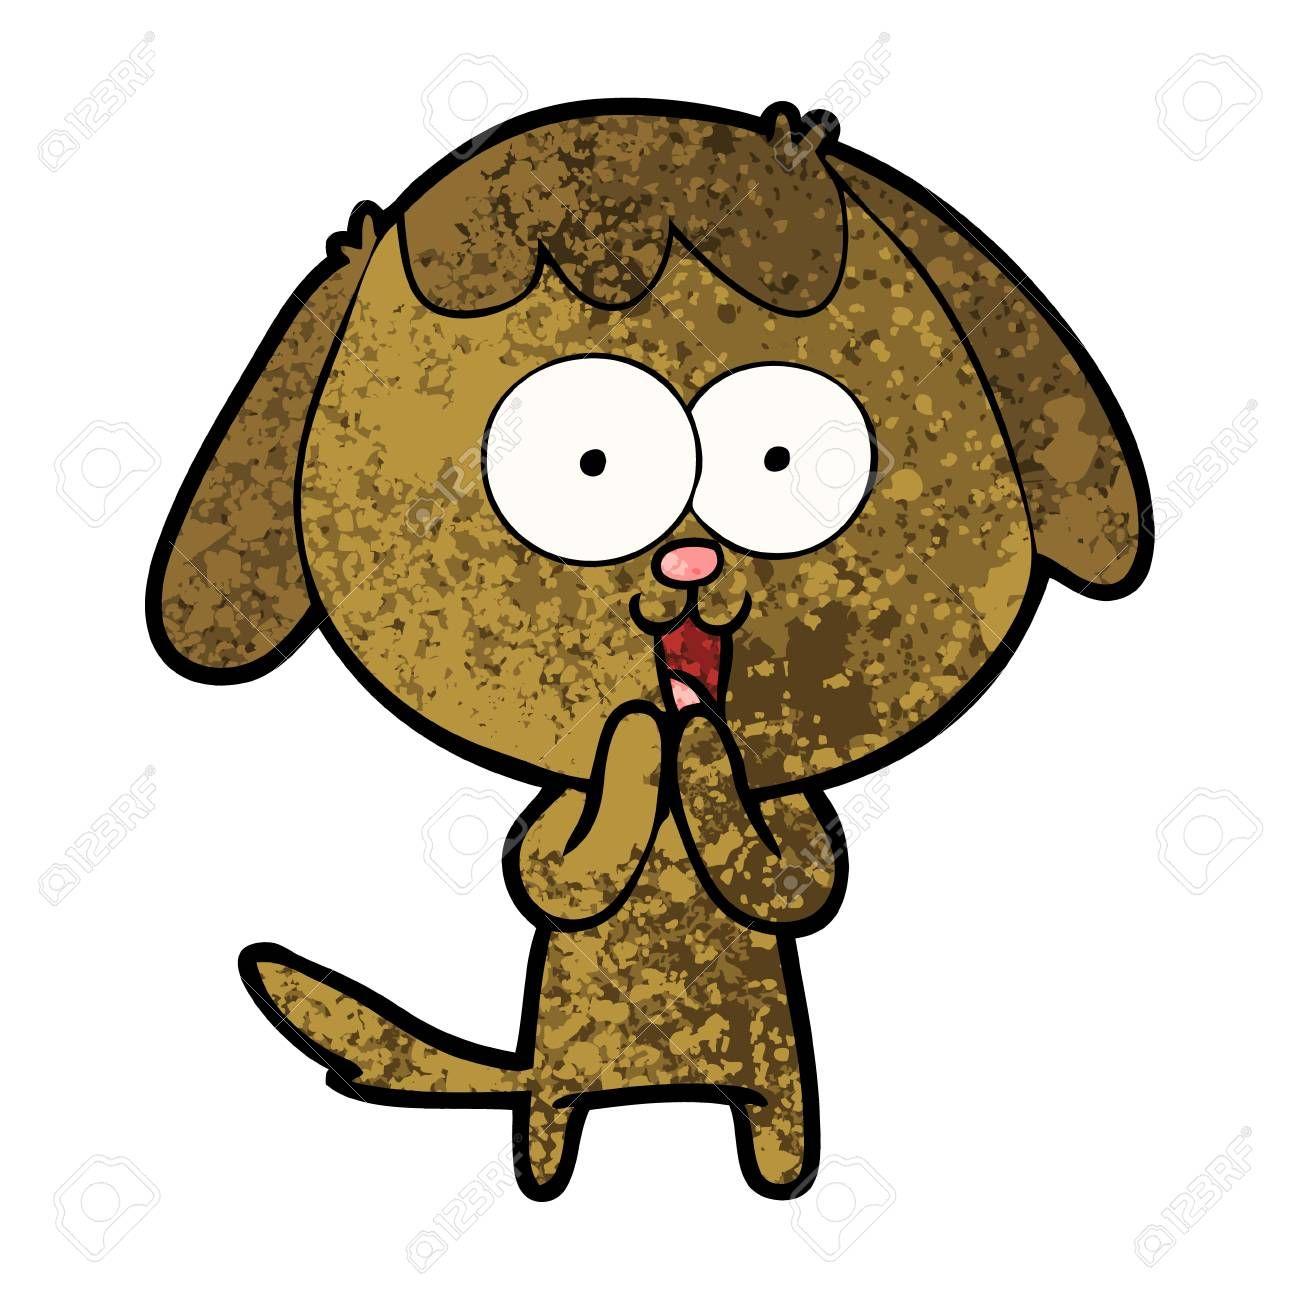 Cute Cartoon Dog Illustration Spon Cartoon Cute Illustration Dog Aesthetic Backgrounds Dog Illustration Cartoon Dog